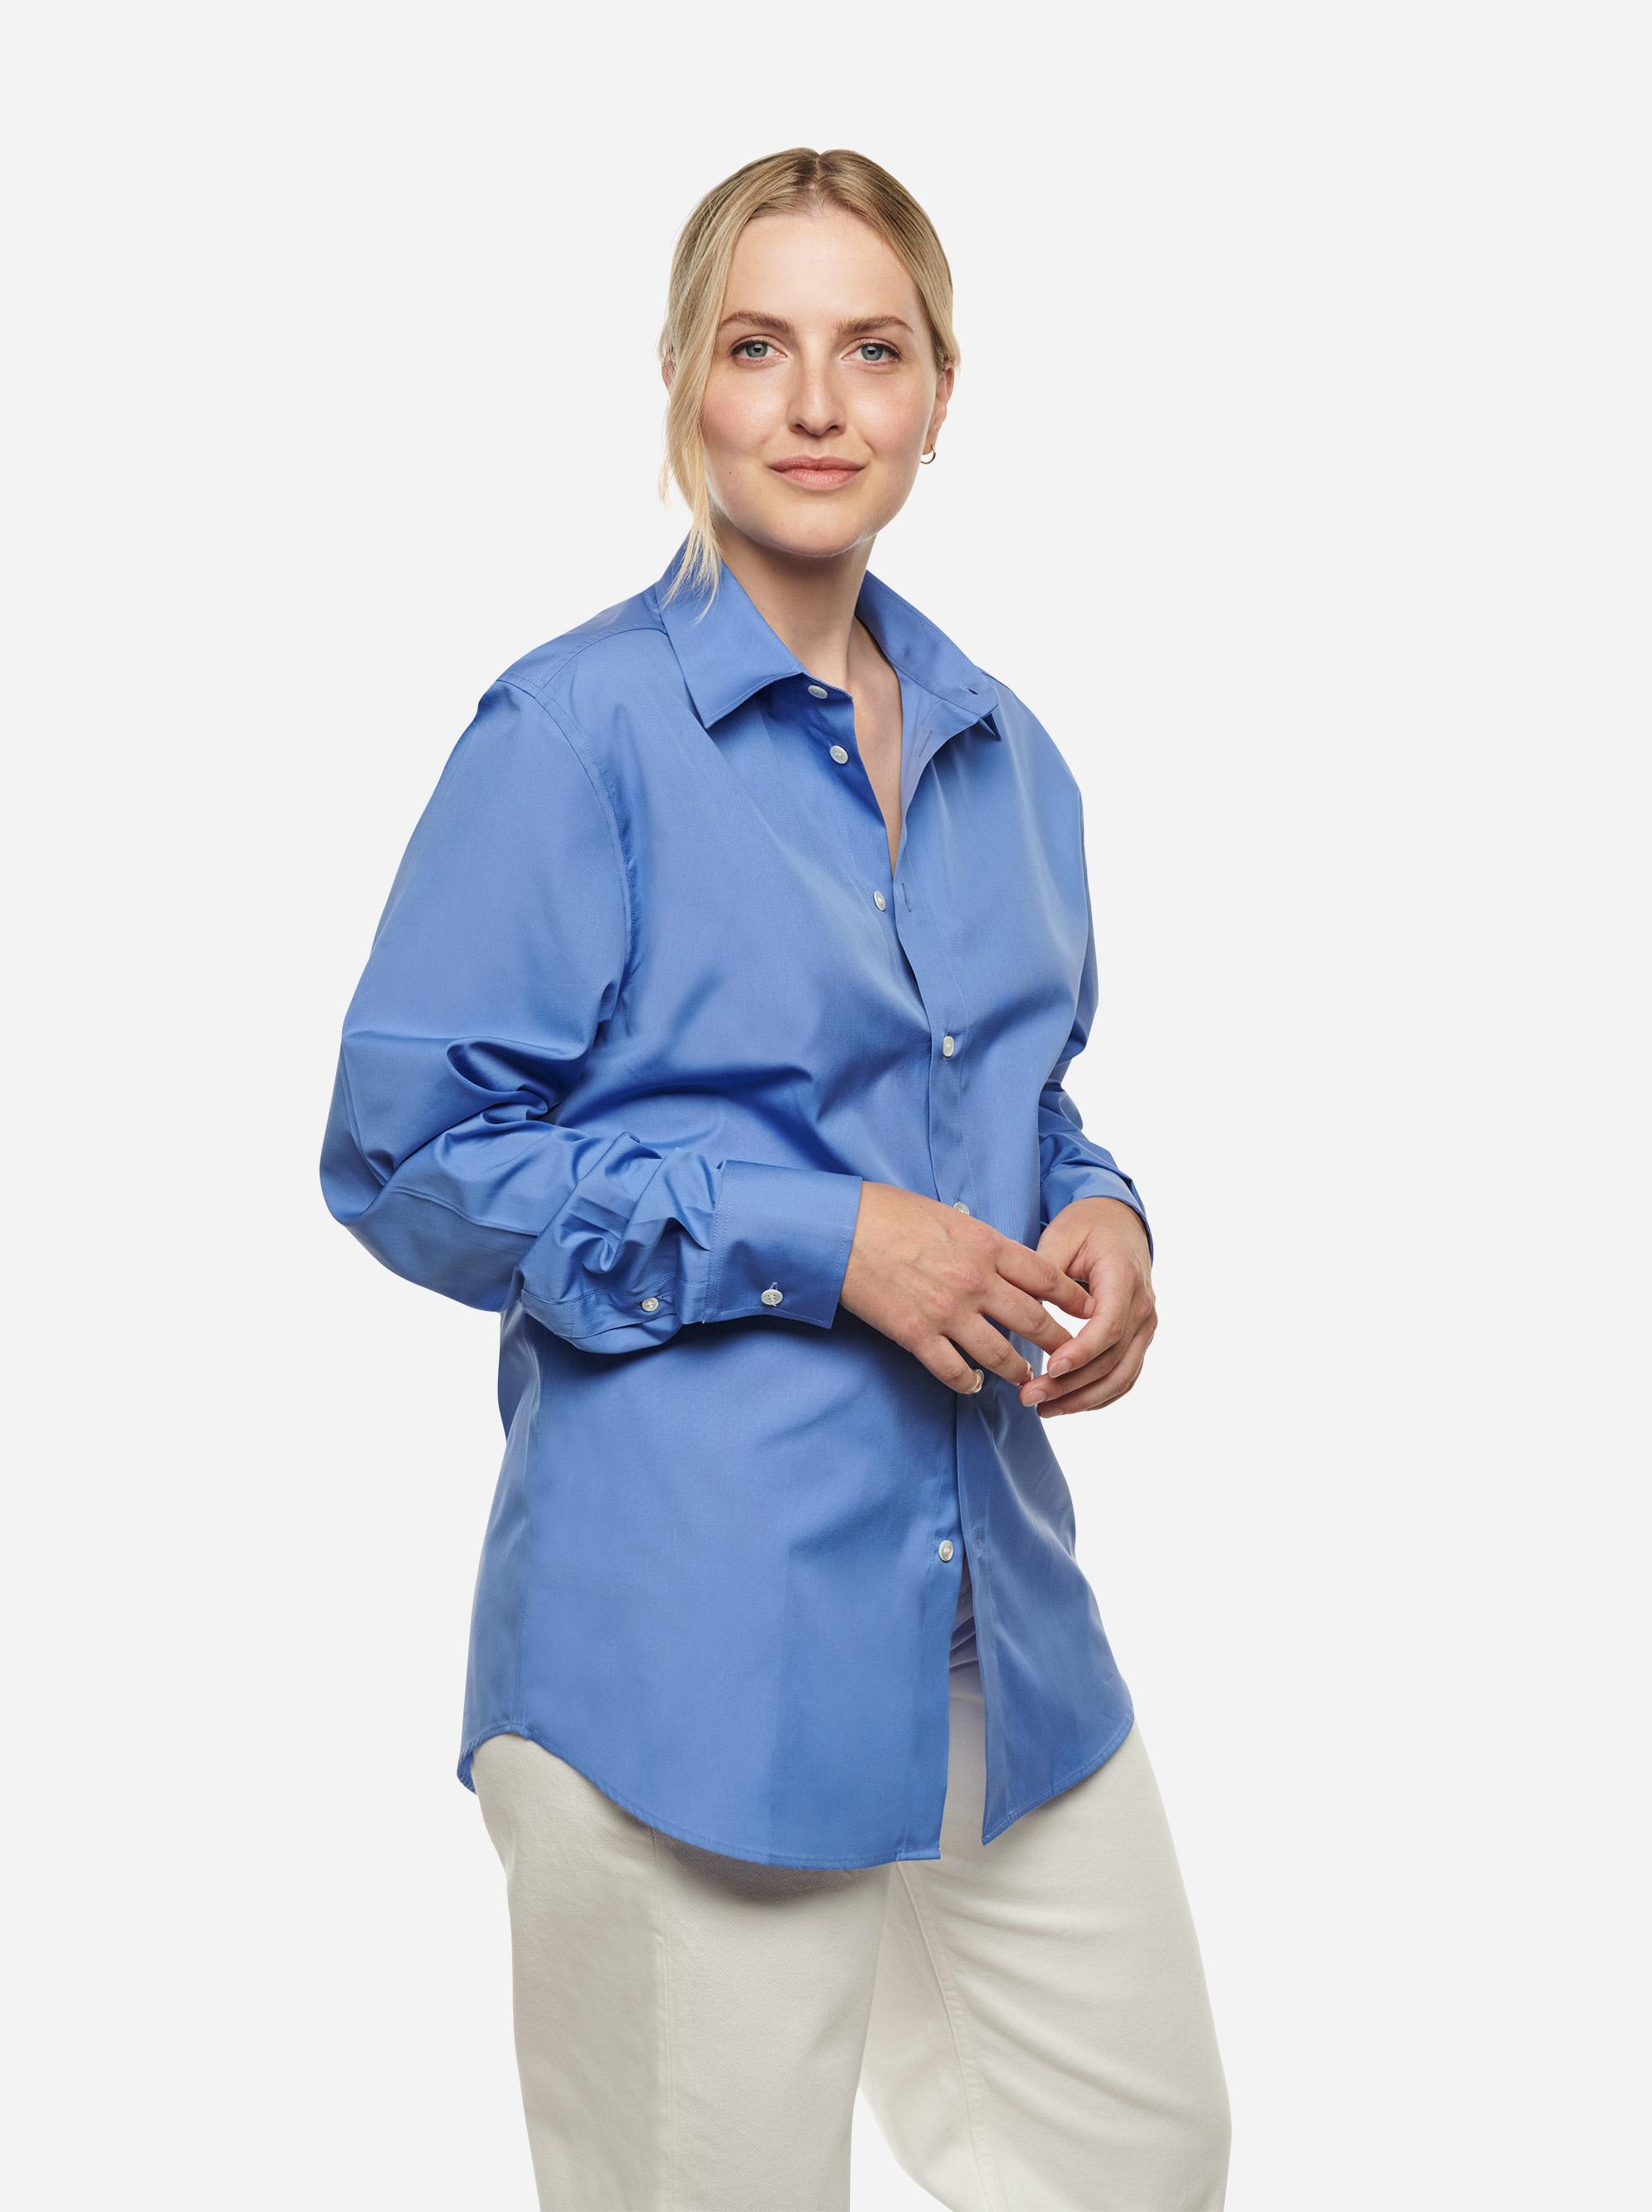 Teym-Shirt-Blue-women-mens-4